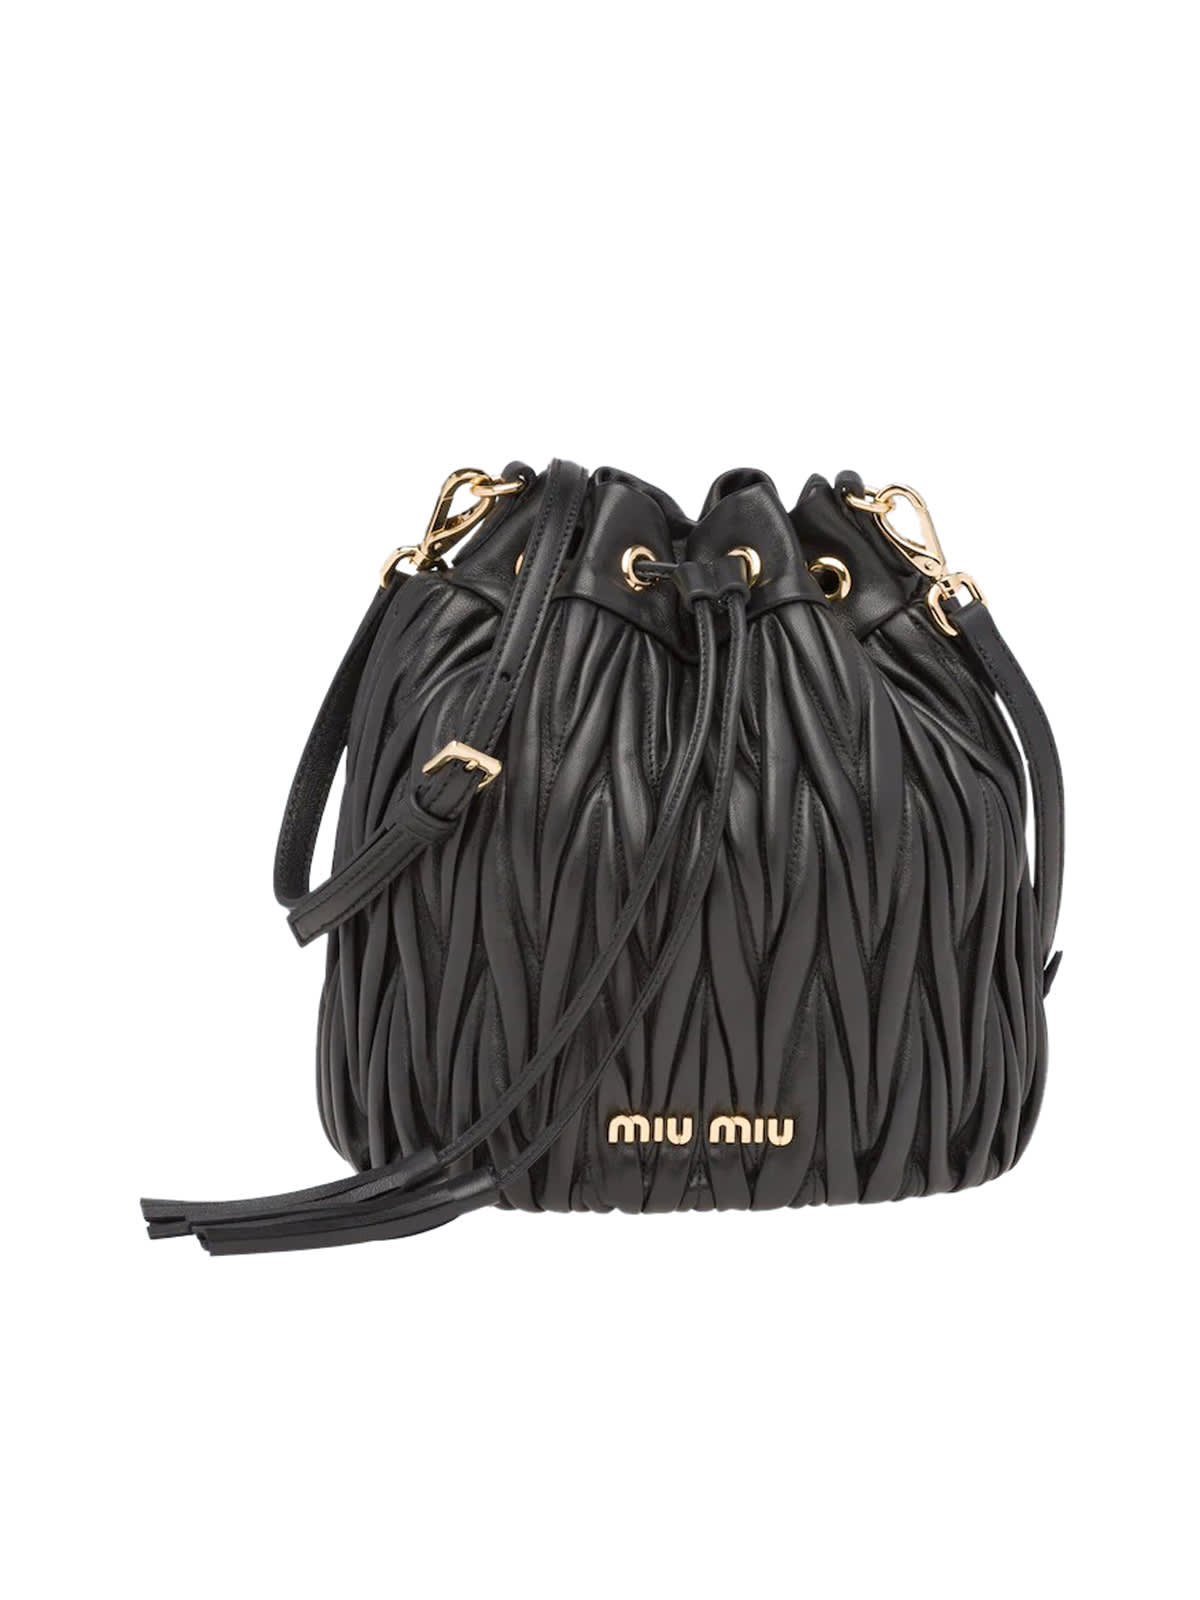 Miu Miu Handbag Matelasse